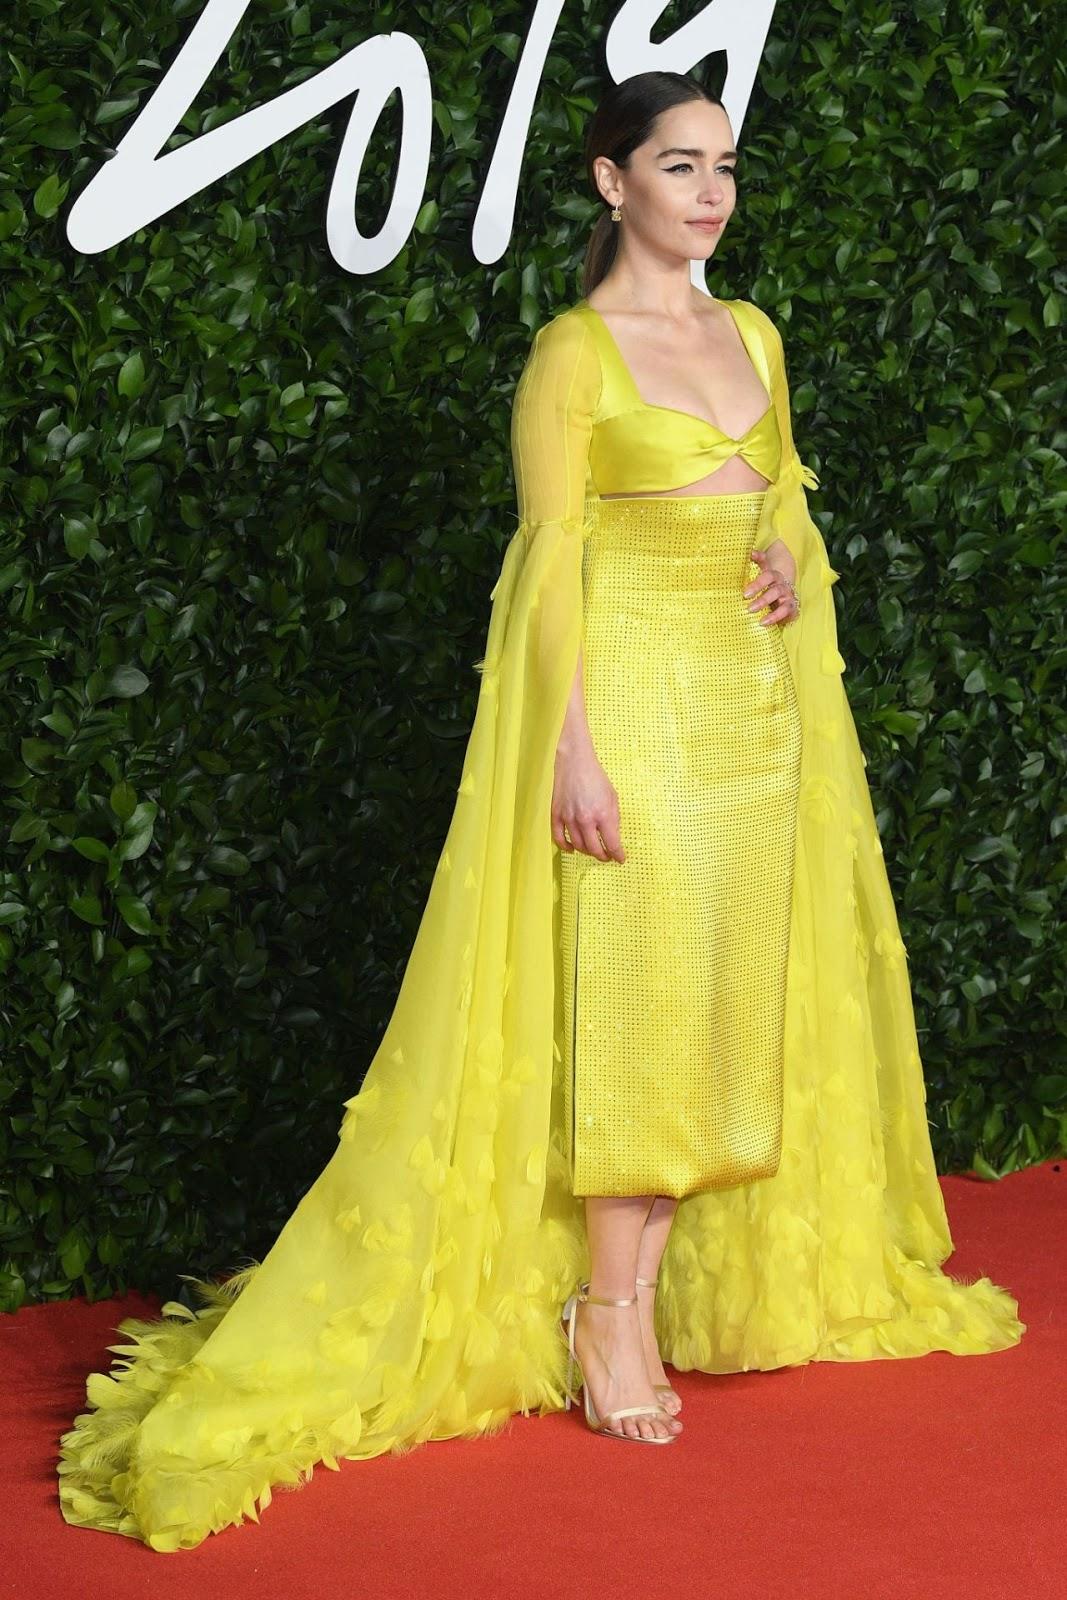 Emilia Clarke – Fashion Awards 2019 Red Carpet at Royal Albert Hall in London